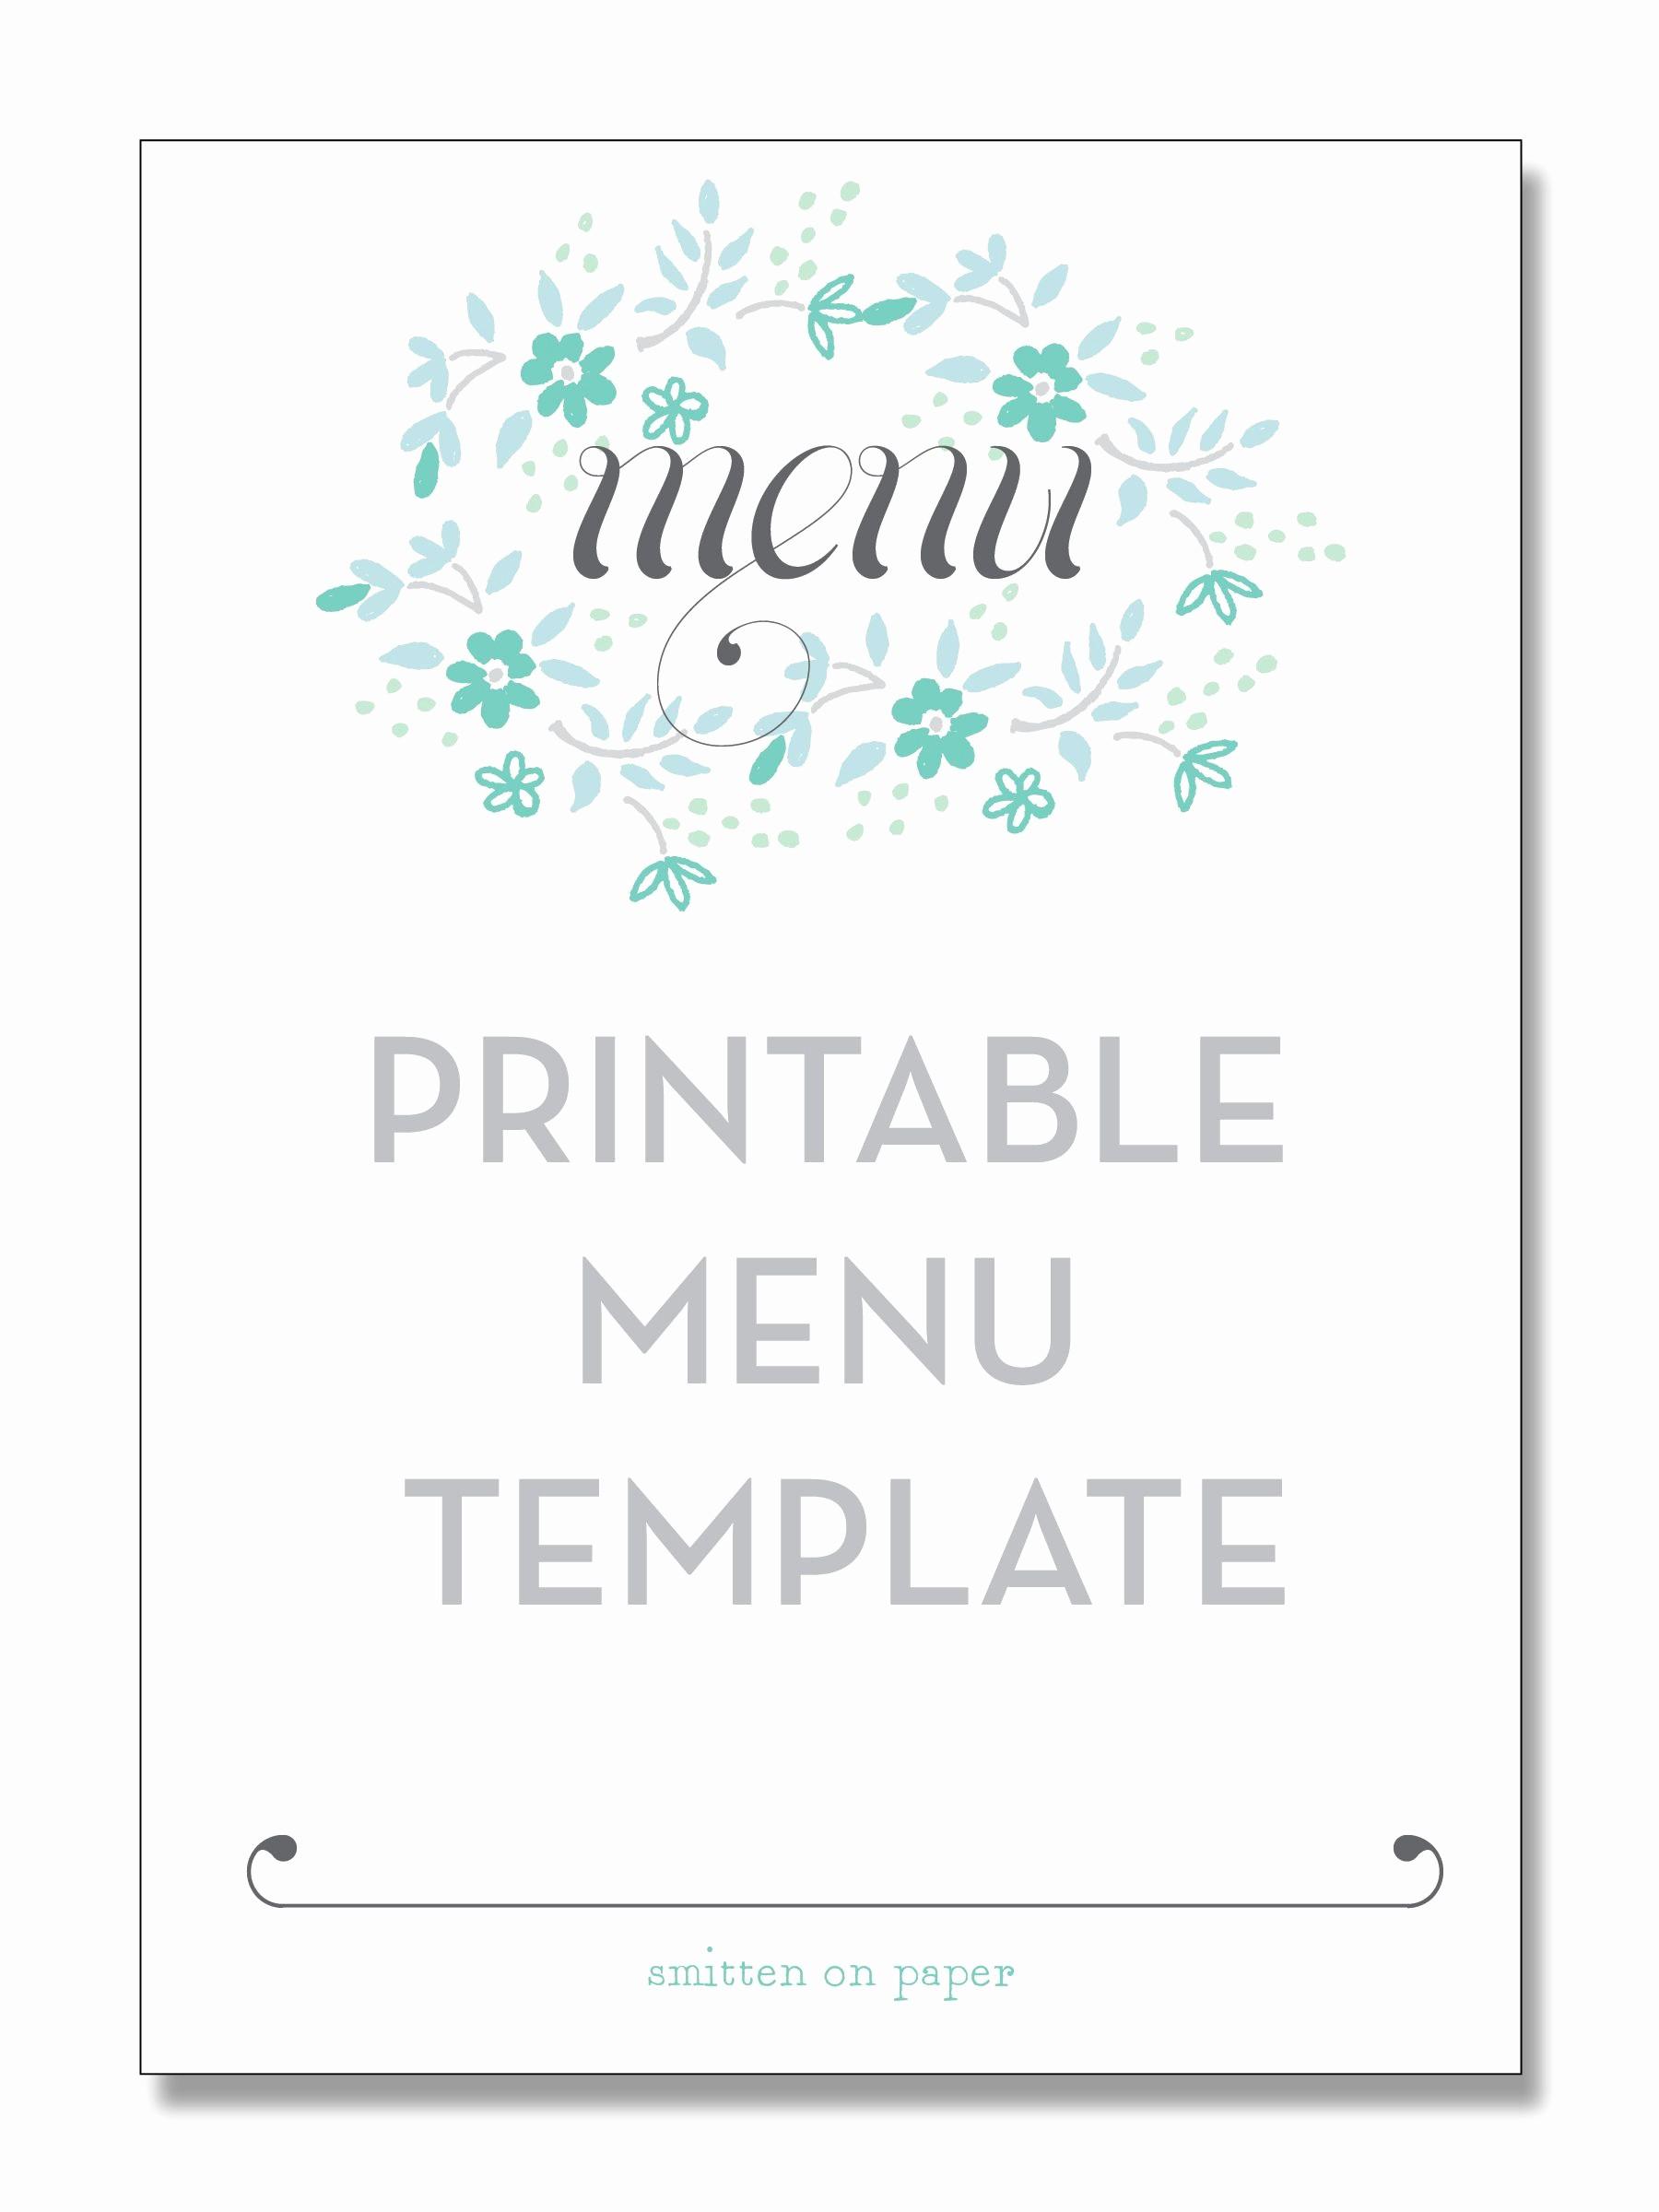 Free Printable Dinner Menu Templates Inspirational Freebie Friday Printable Menu Party Time